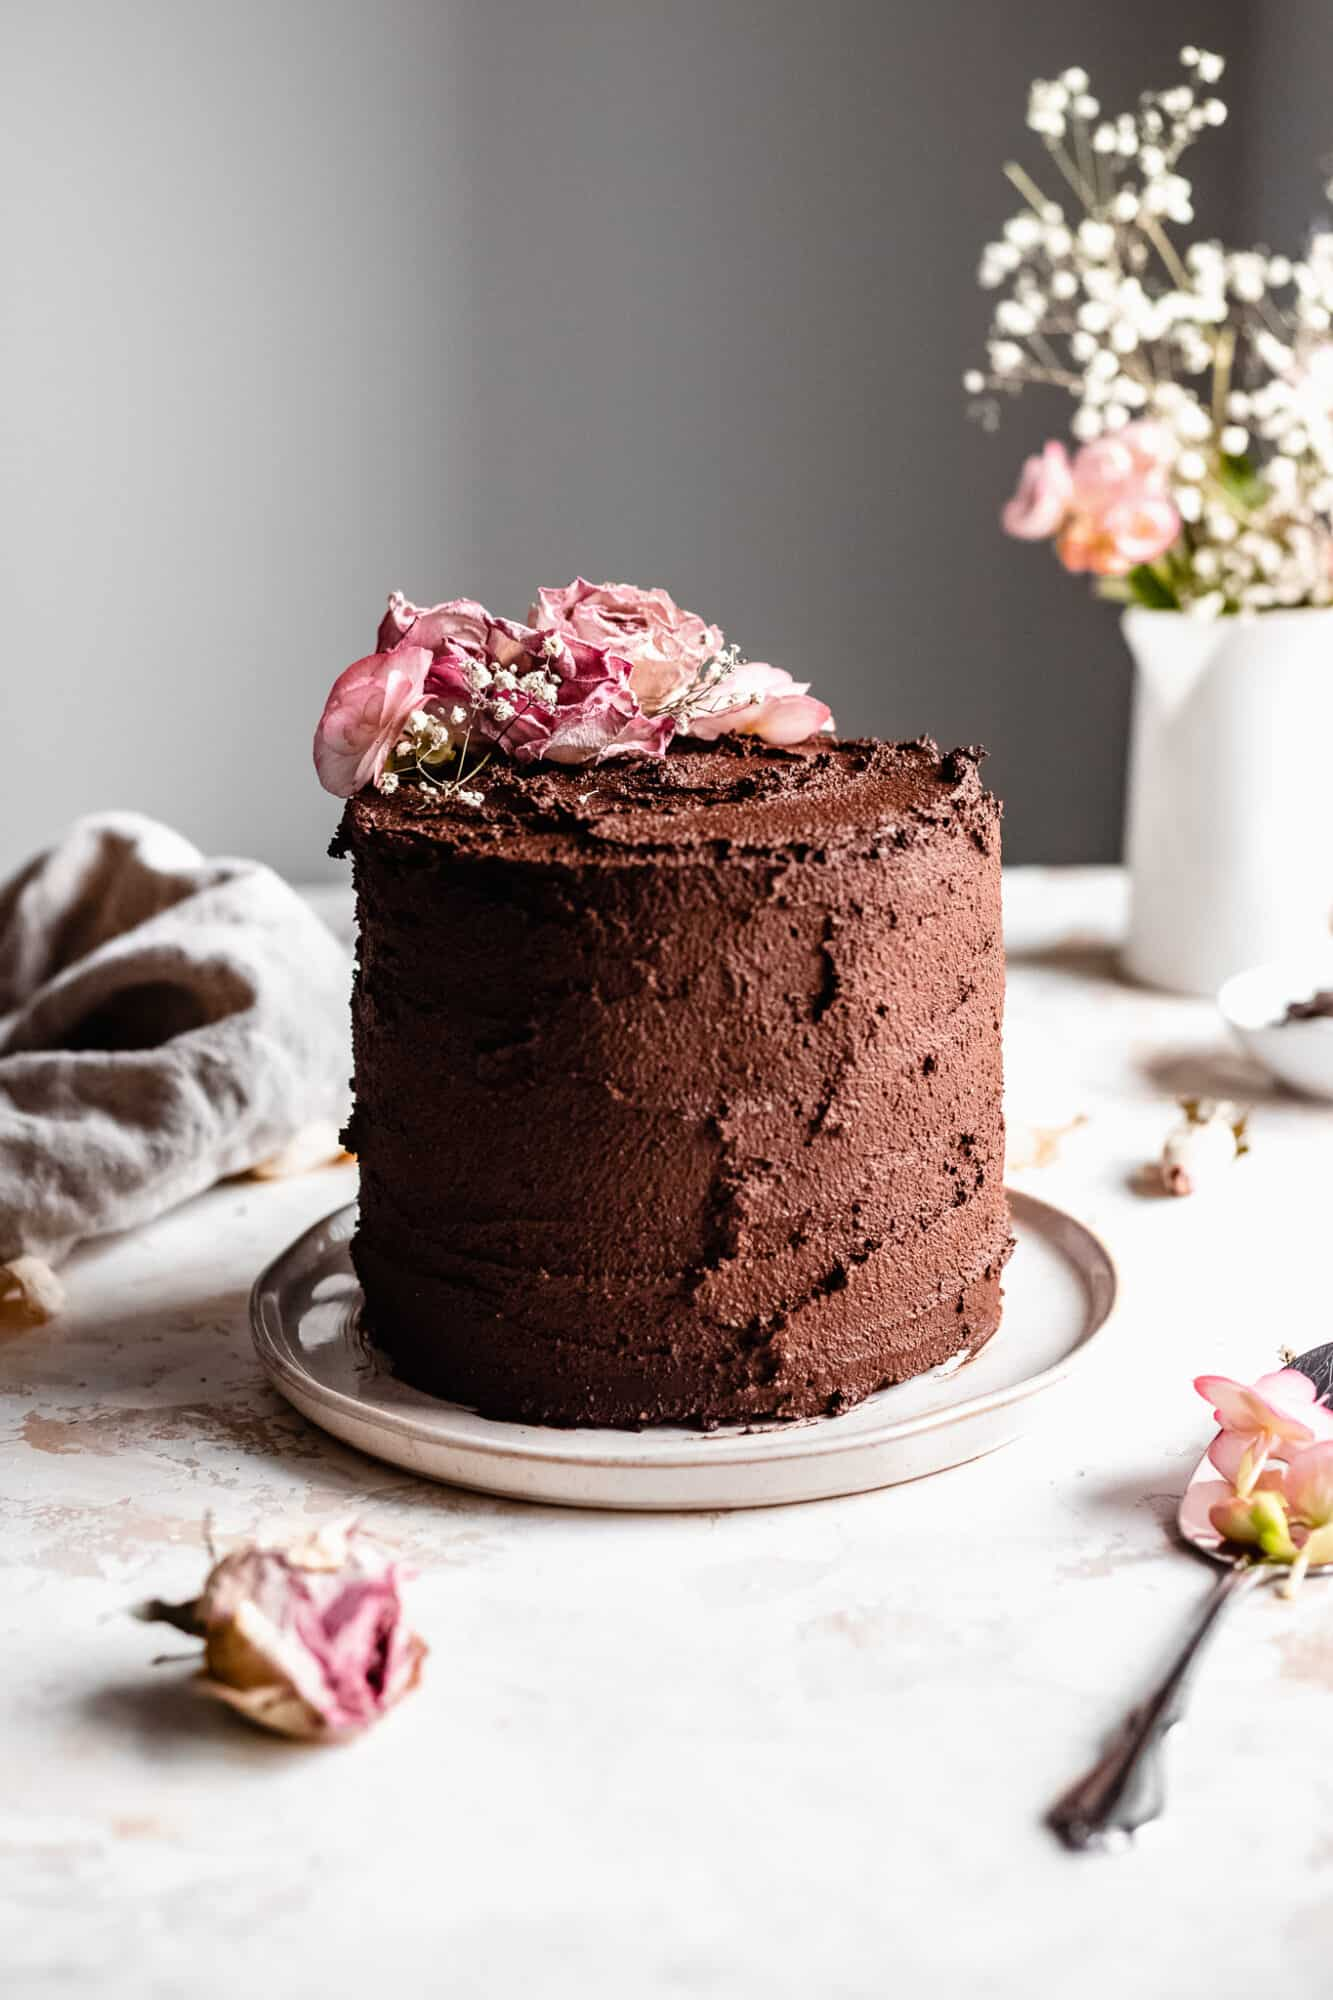 paleo chocolate cake with flowers